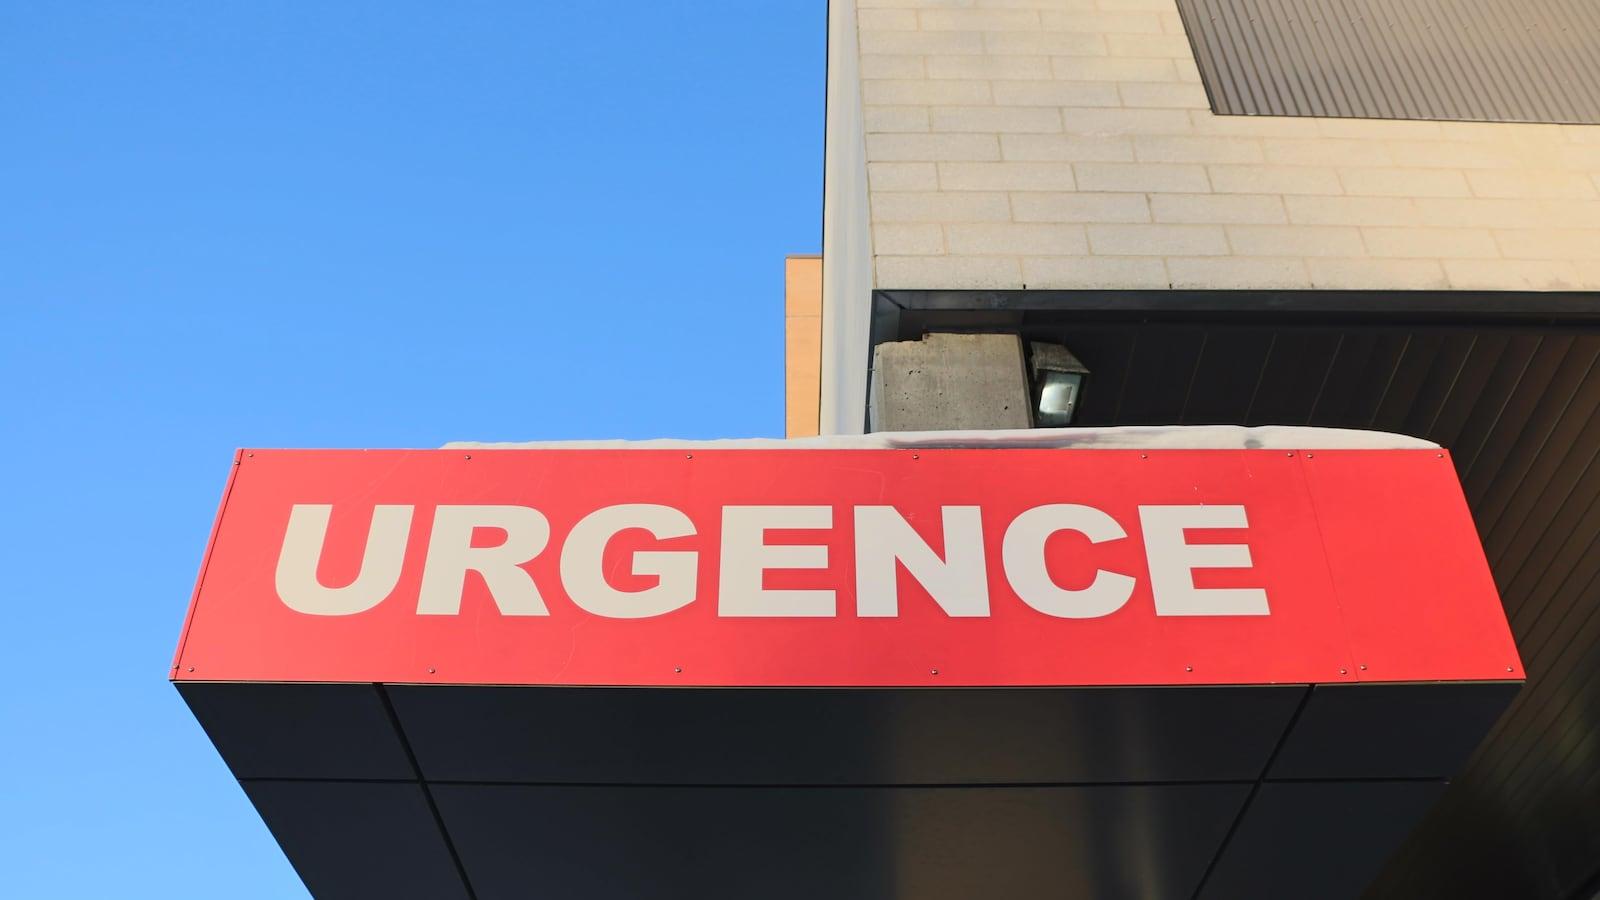 L'urgence d'un hôpital.